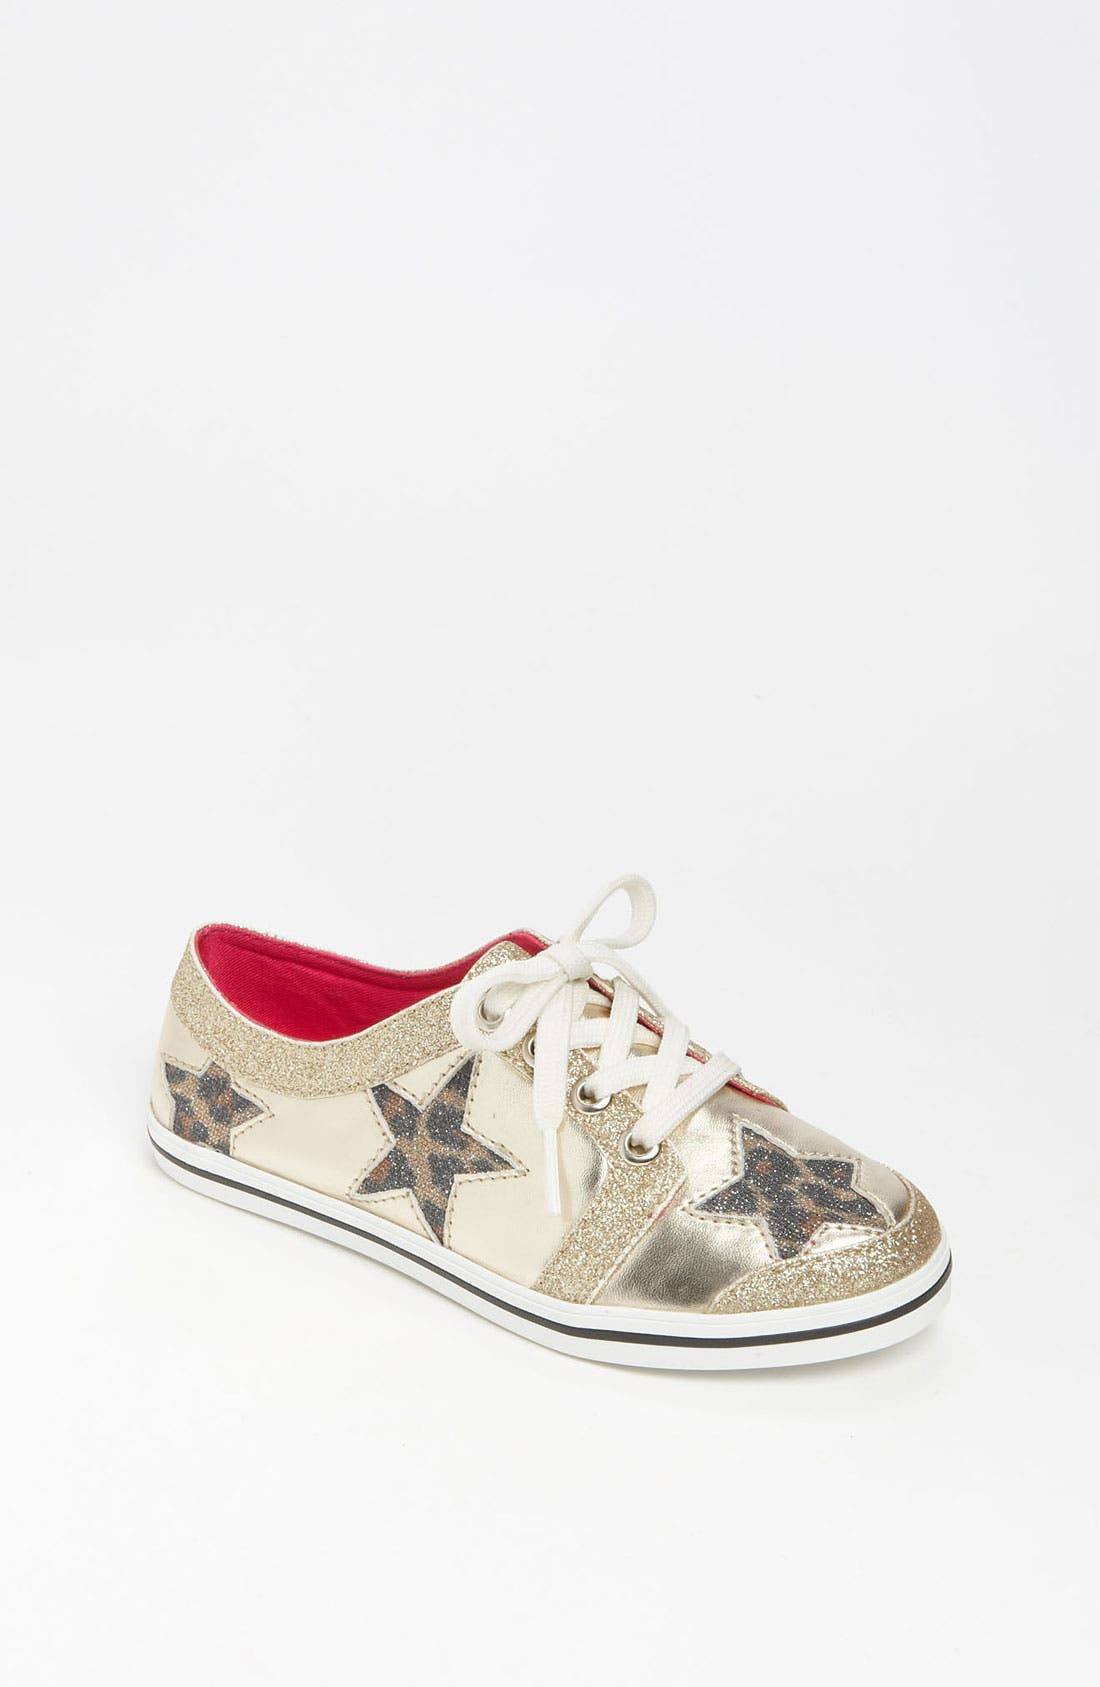 Alternate Image 1 Selected - Juicy Couture 'Star' Sneaker (Toddler, Little Kid & Big Kid)